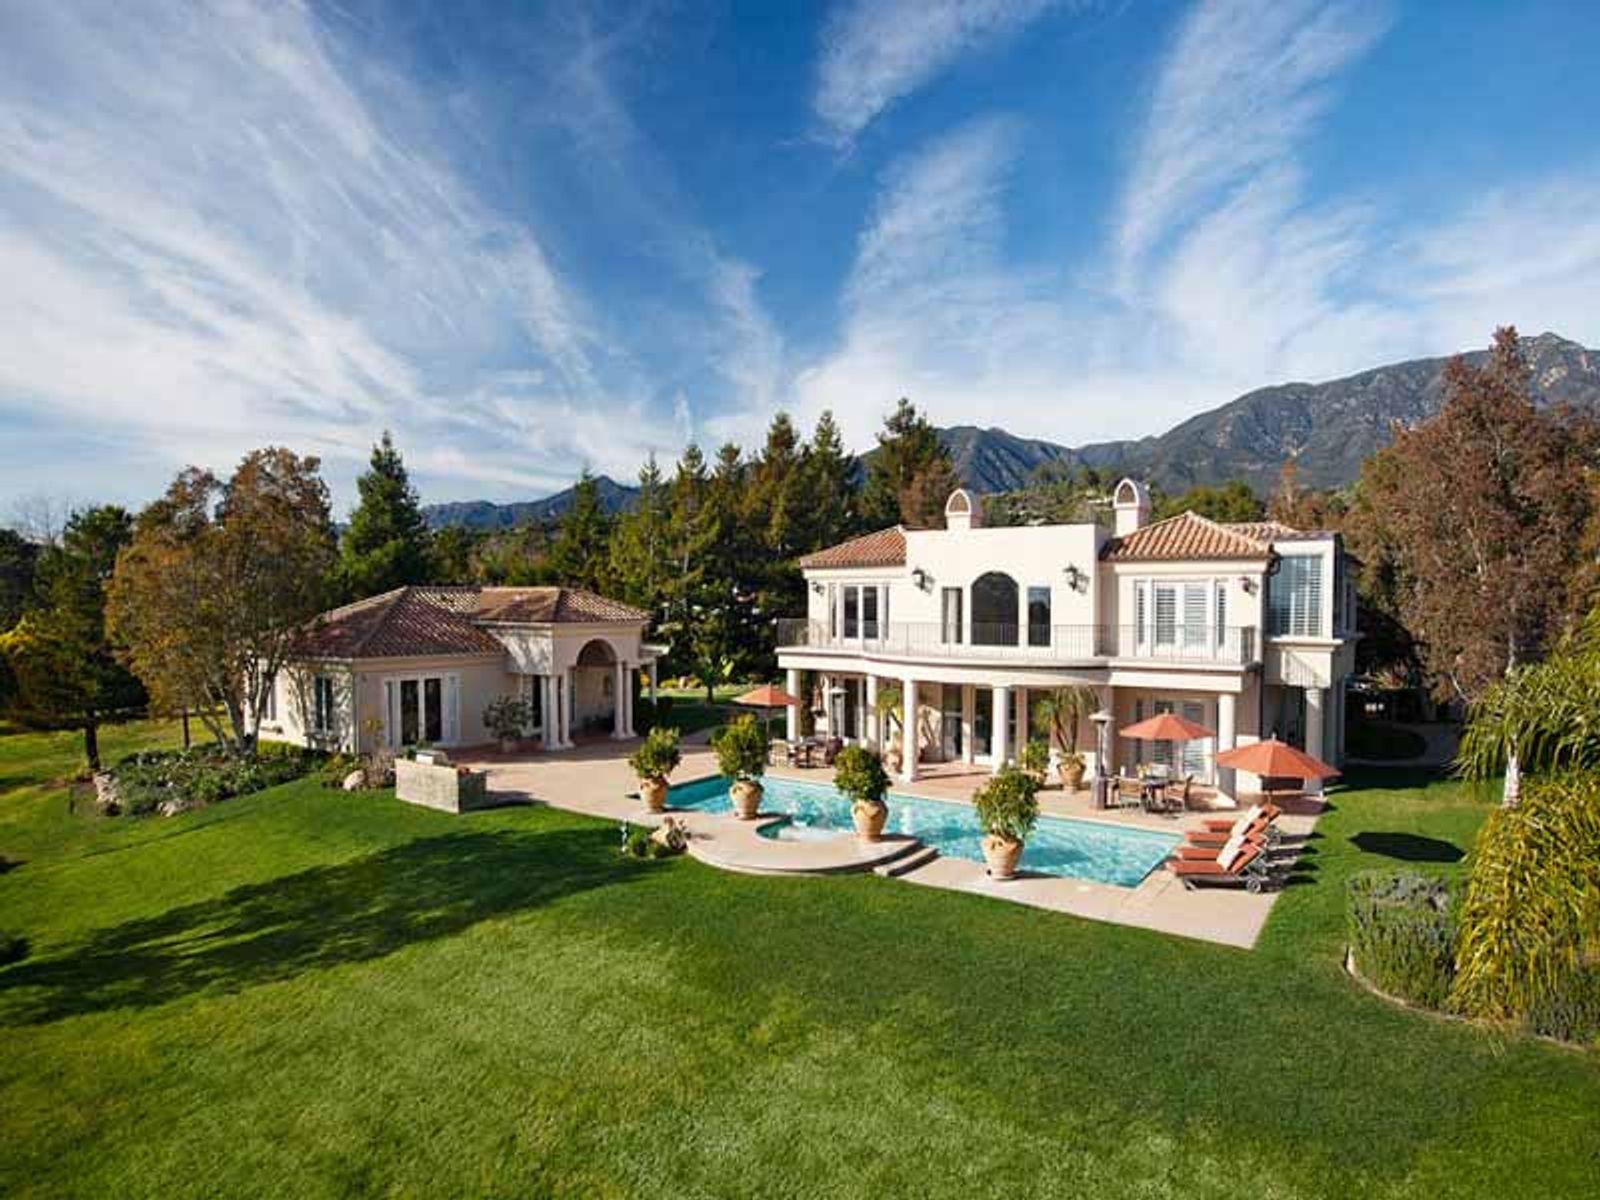 Elegant ocean view home carpinteria ca single family home for Real estate in carpinteria ca